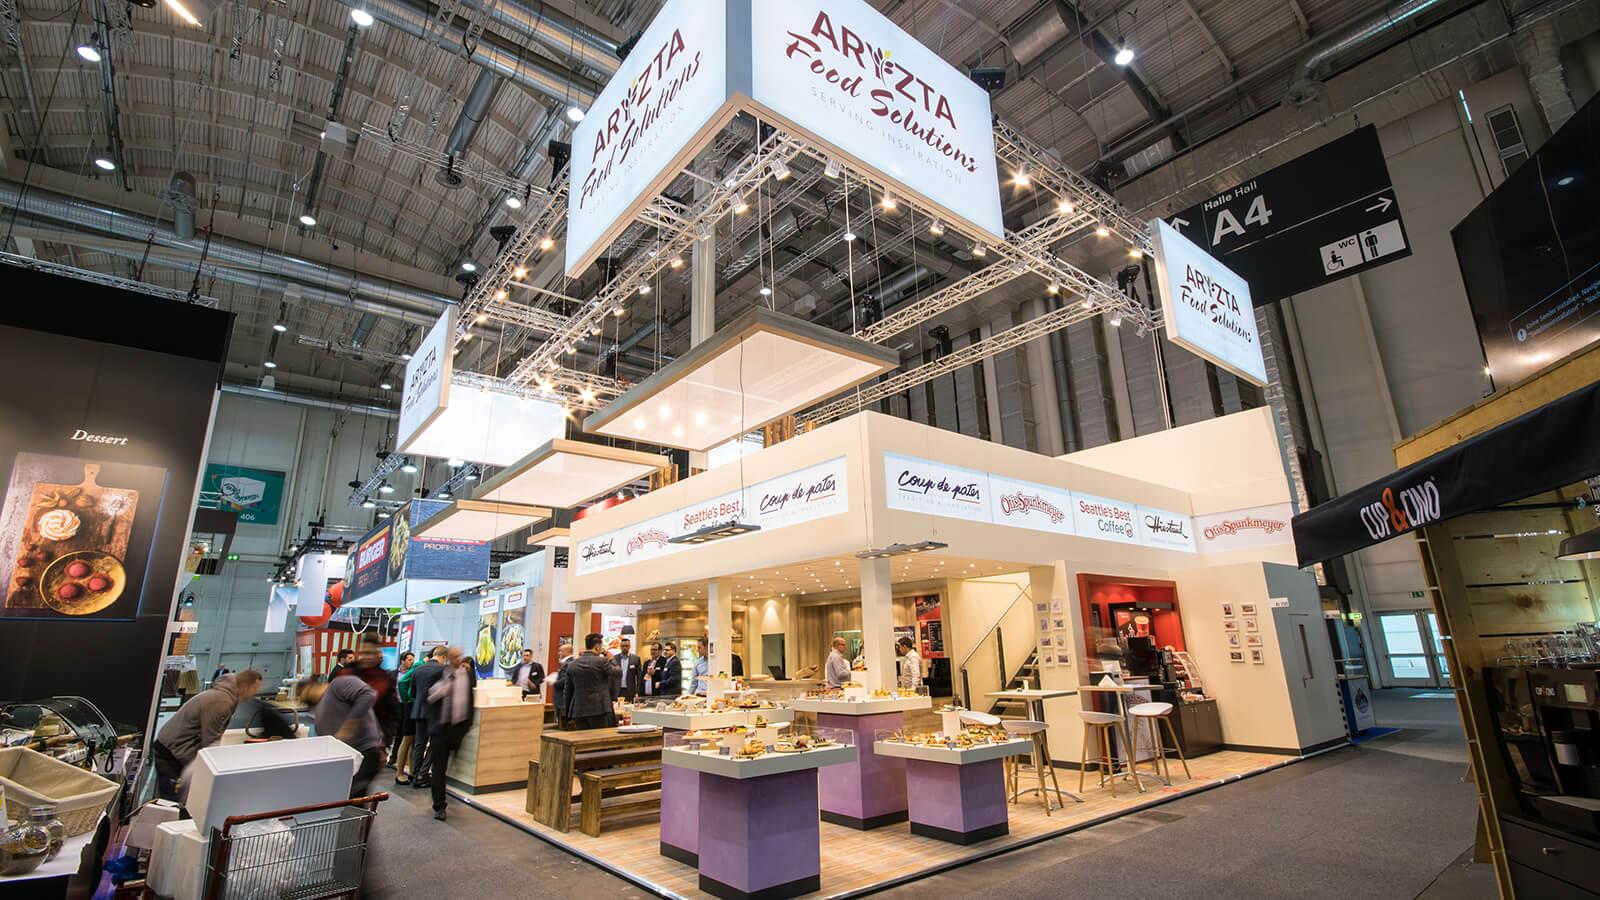 Aryzta<br>218 m²<br>INTERNORGA